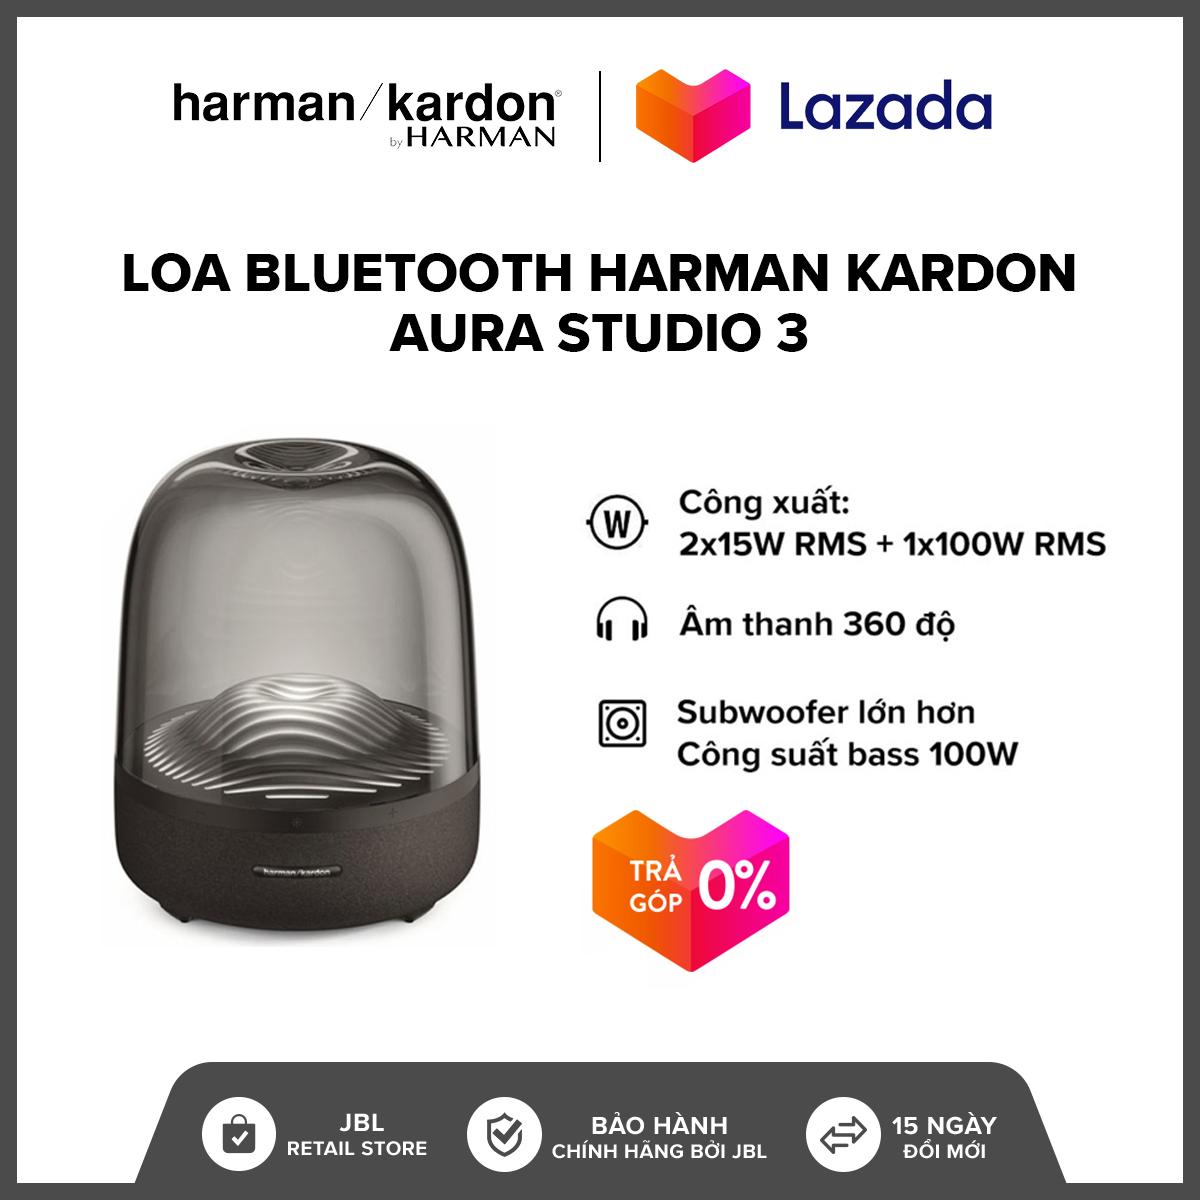 [VOUCHER 1200K – TRẢ GÓP 0%] Loa Bluetooth Harman Kardon Aura Studio 3 l Công suất: 2 x 15W RMS + 1 x 100W RMS l 45Hz-20kHz l Bluetooth 4.2